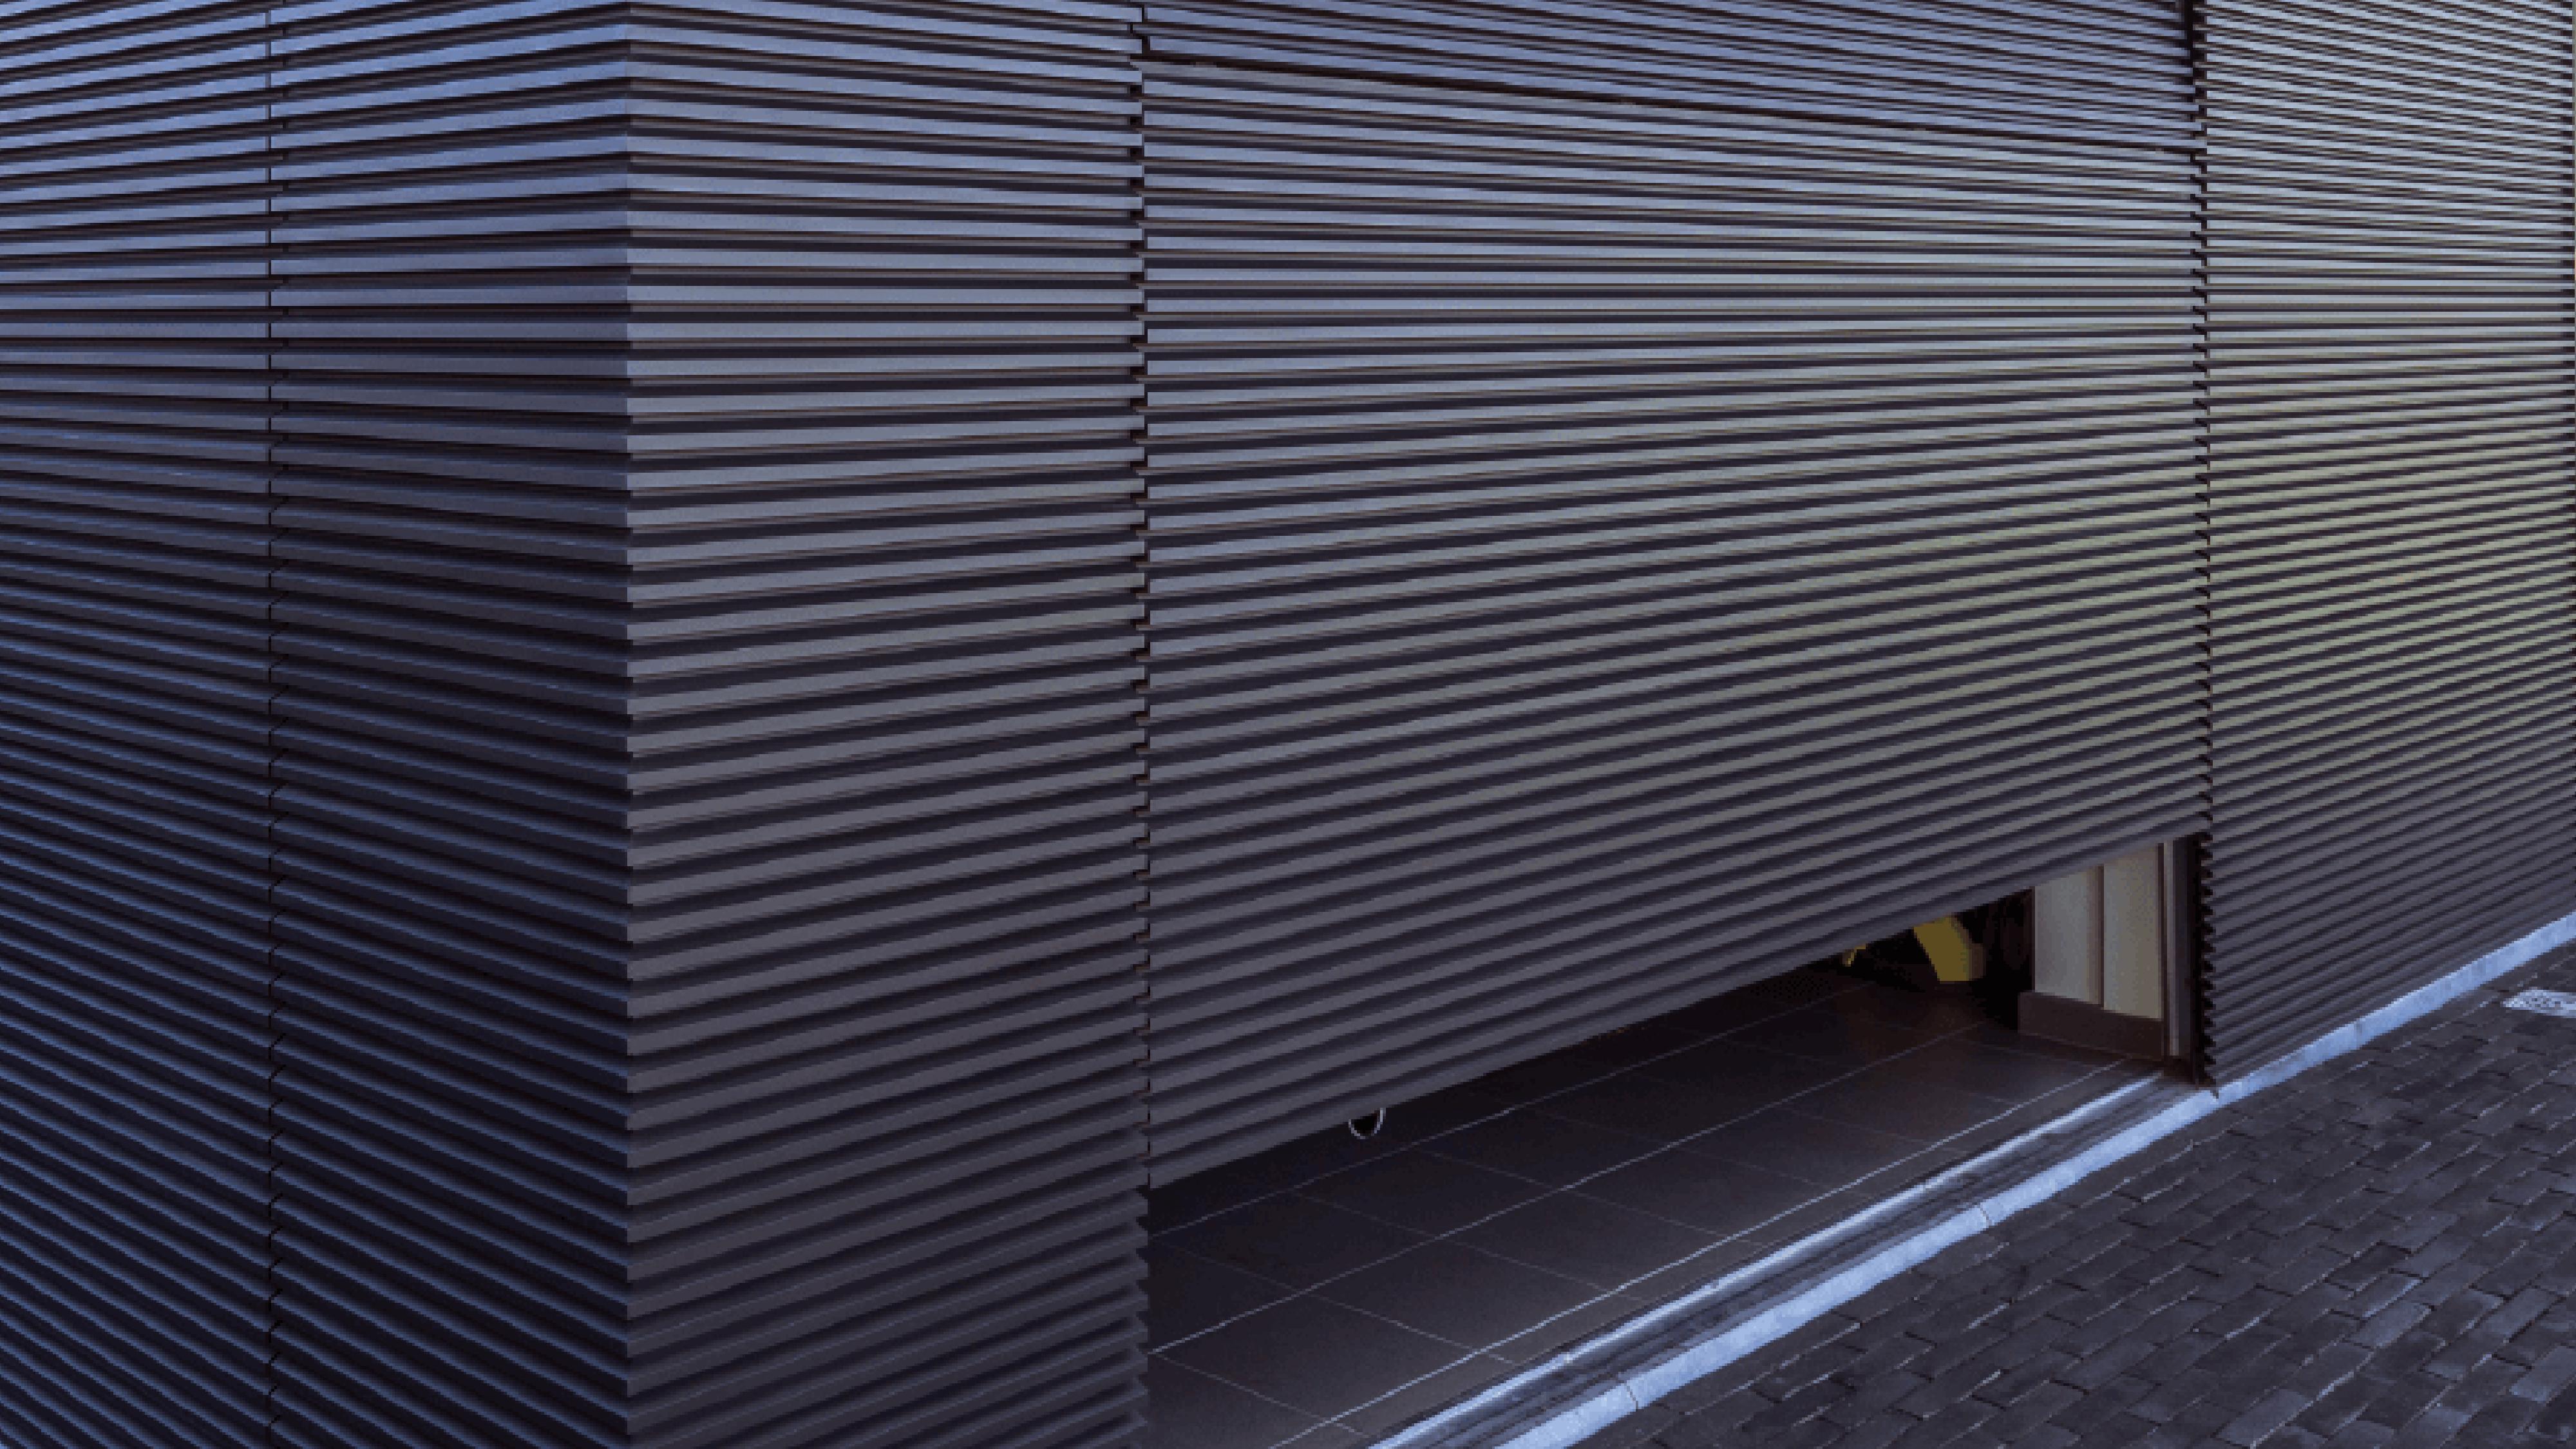 Alu-Wall Bekleding Secionale Poort Aluminium Profielen